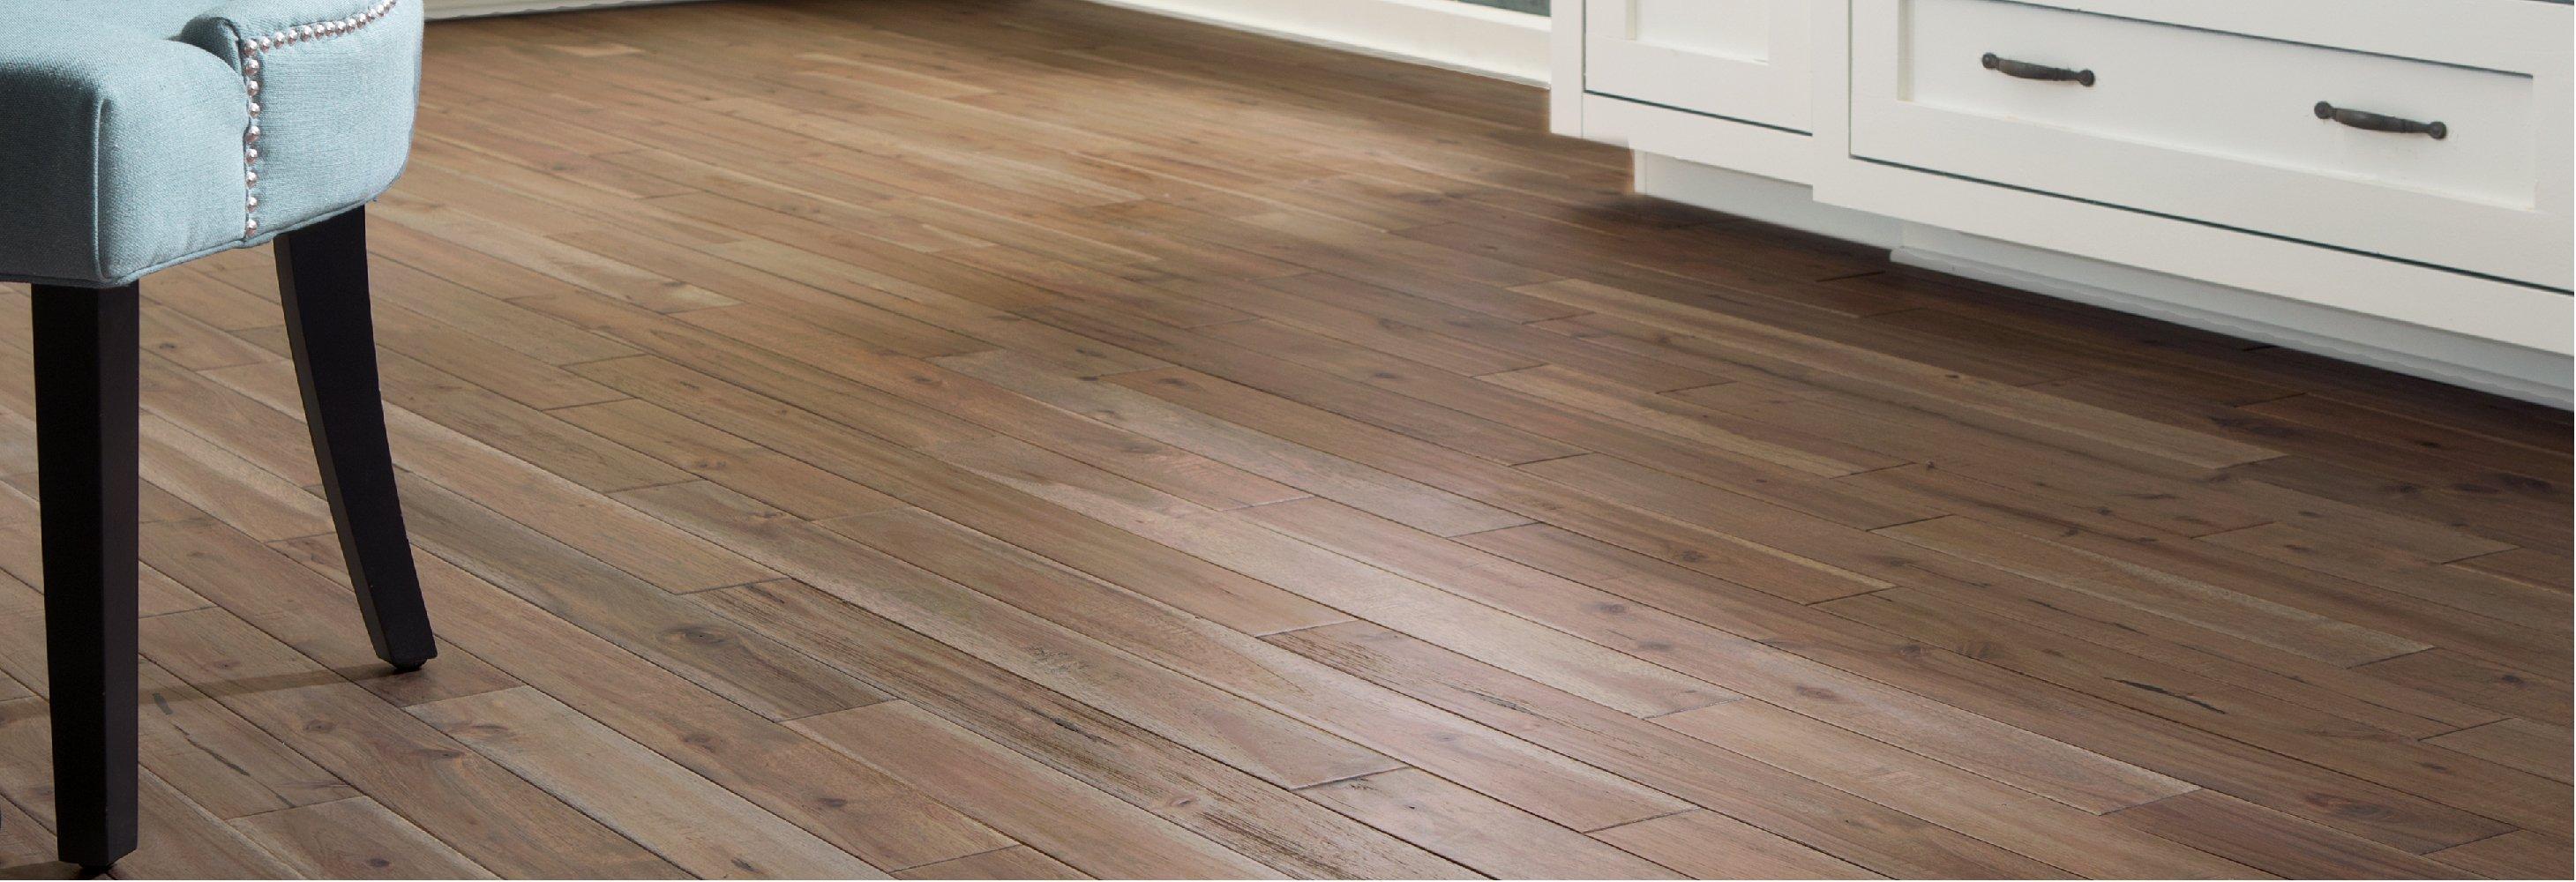 prefinished wood flooring solid hardwood flooring LNYAMFO